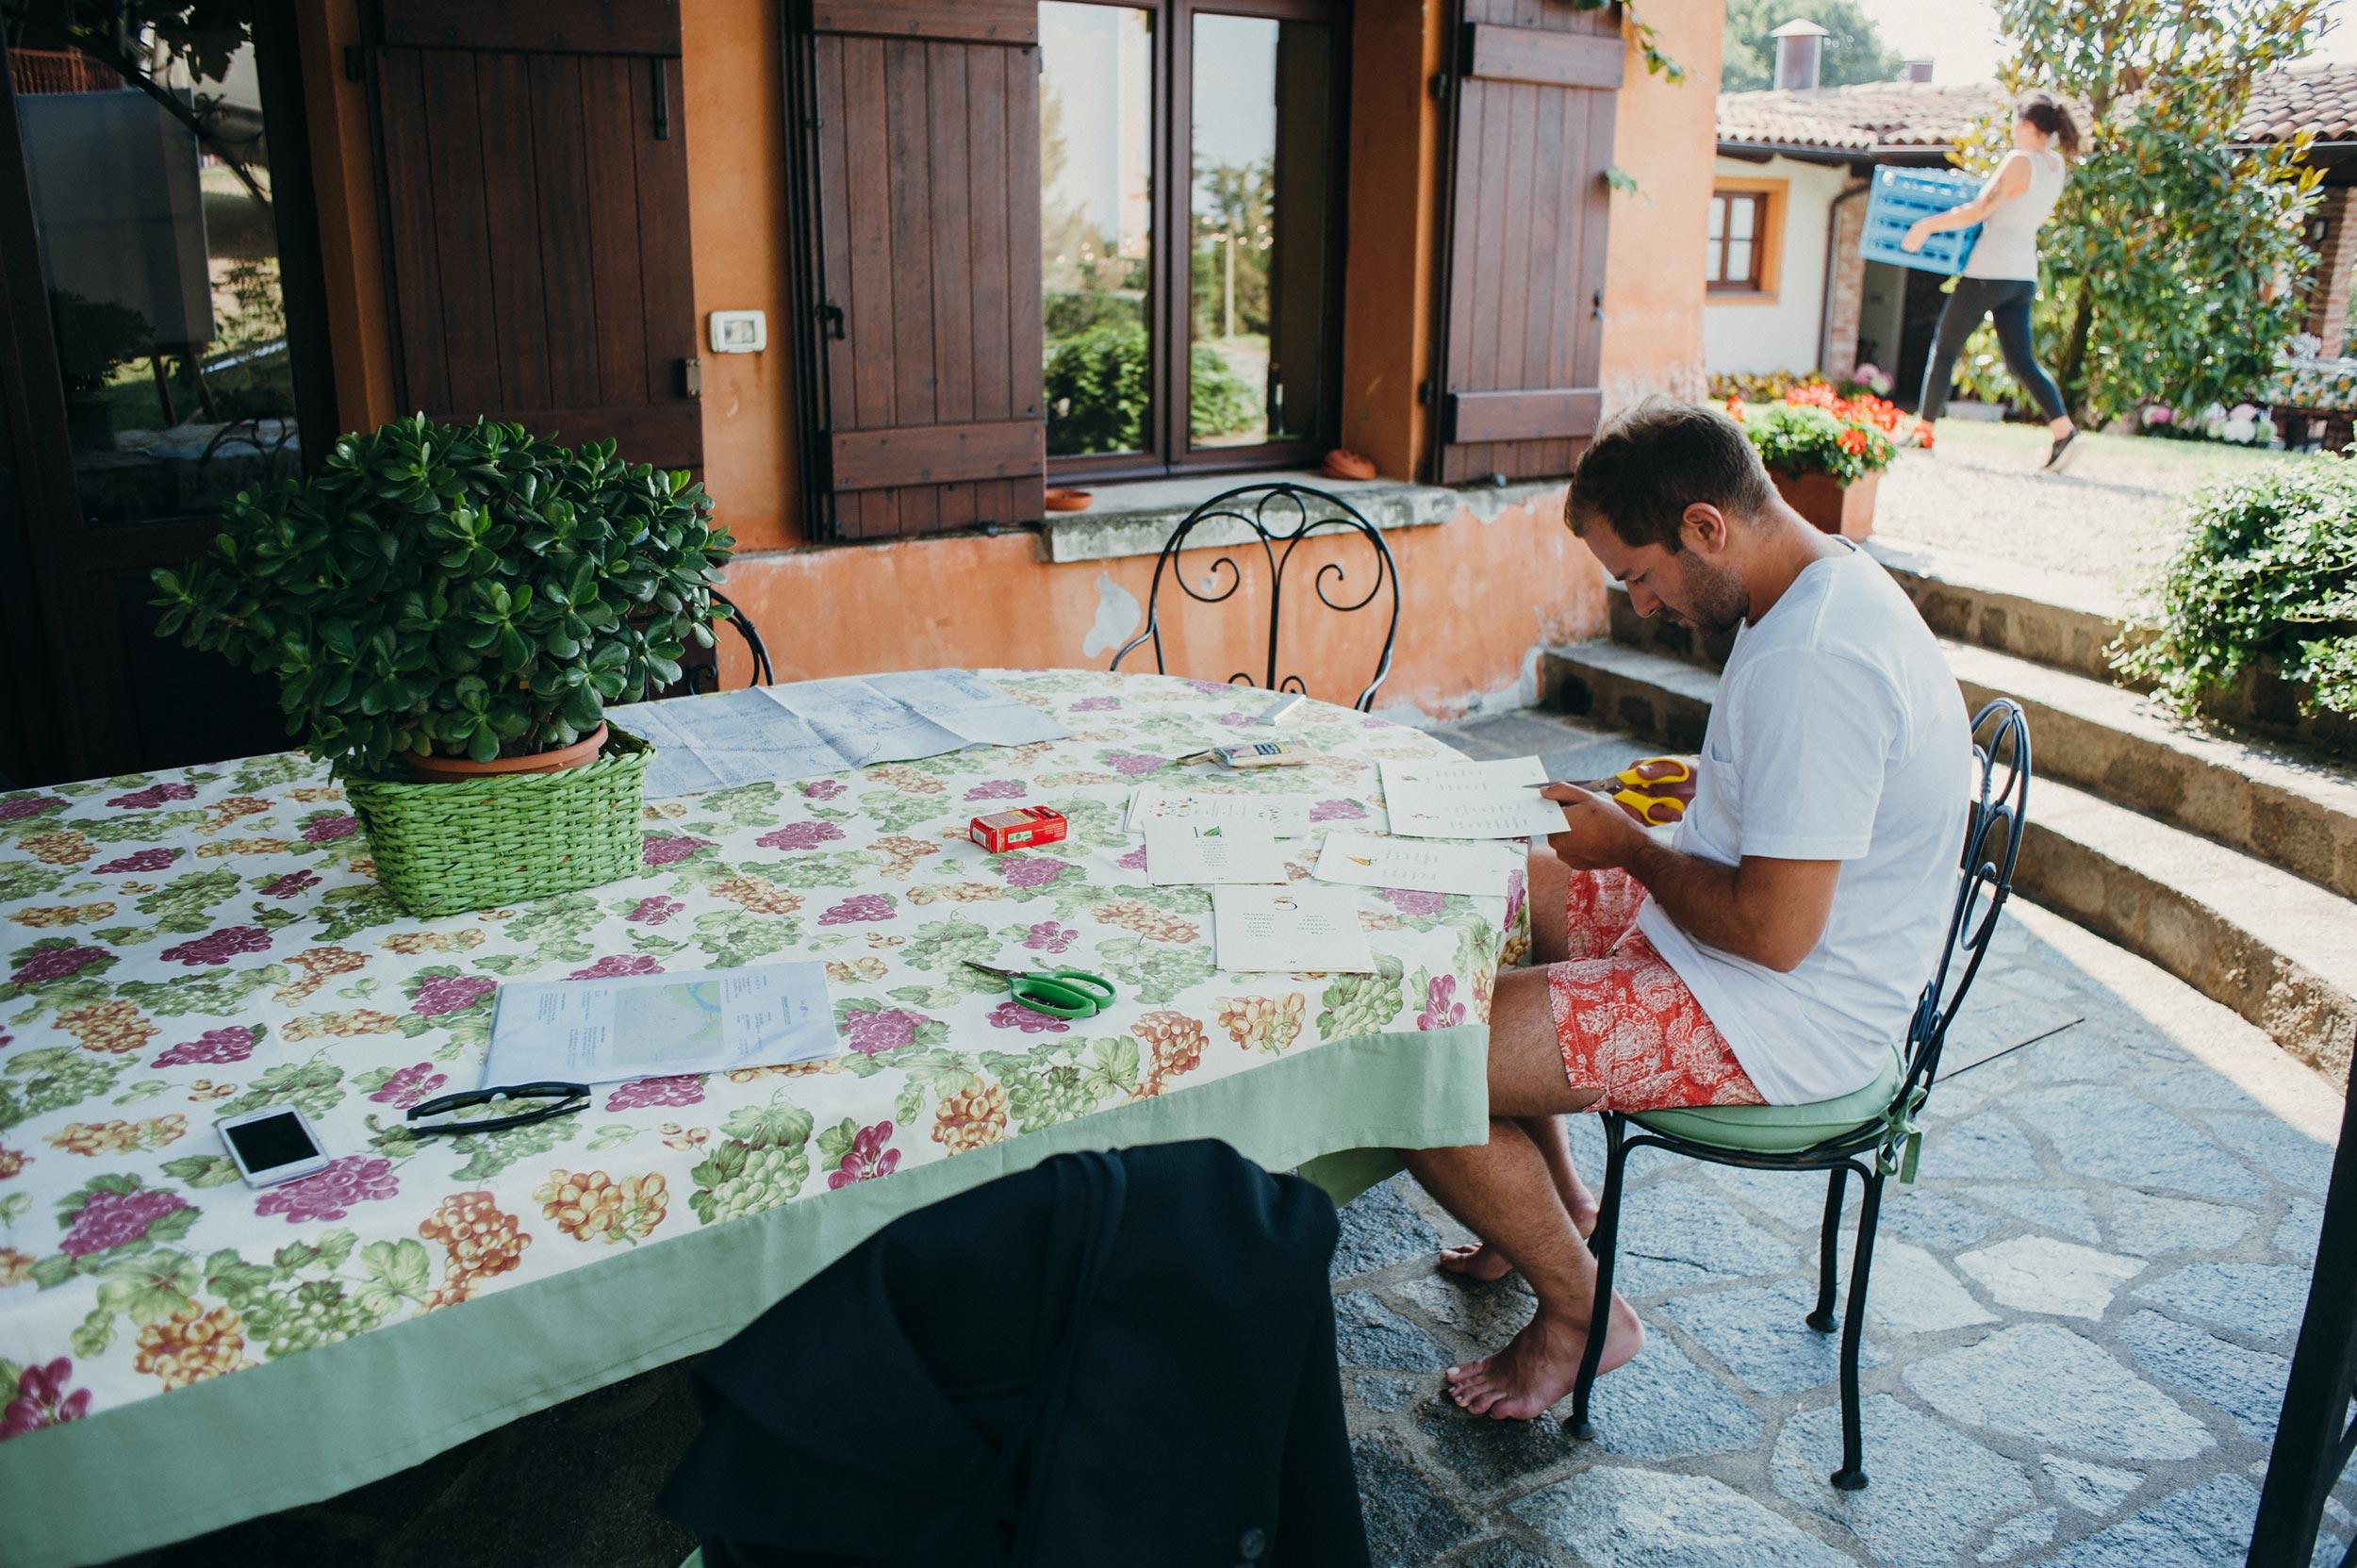 2016-Davor-Chiara-Monferrato-Asti-Vercelli-Wedding-Photographer-Italy-Alessandro-Avenali-1.jpg